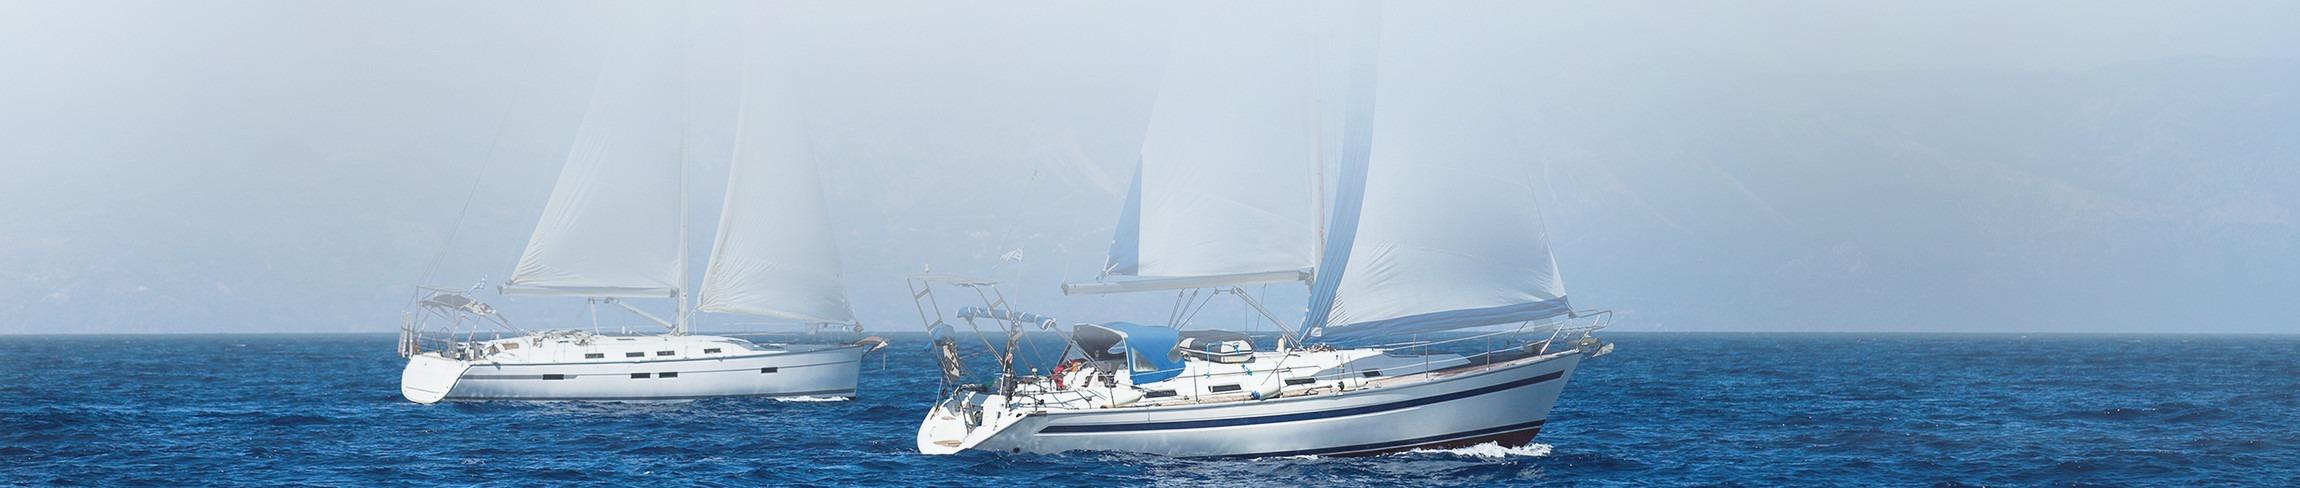 bareboat yacht charters, crewed yacht charter, crewed sailing holidays, luxury sailing holidays, discounted bareboat yacht charters